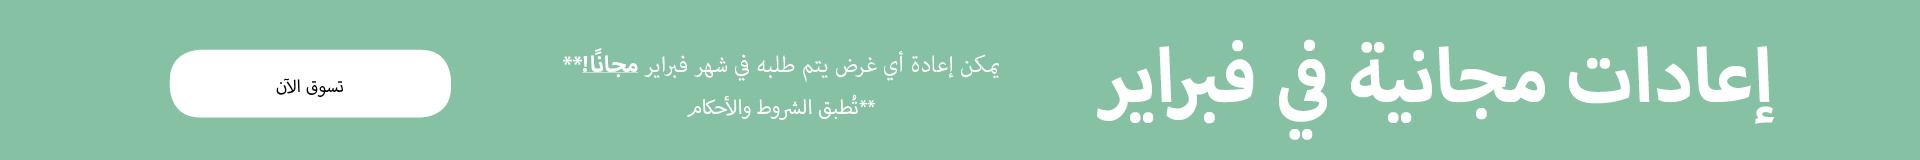 FreeReturns_Strip_Banner_Arabic_DT